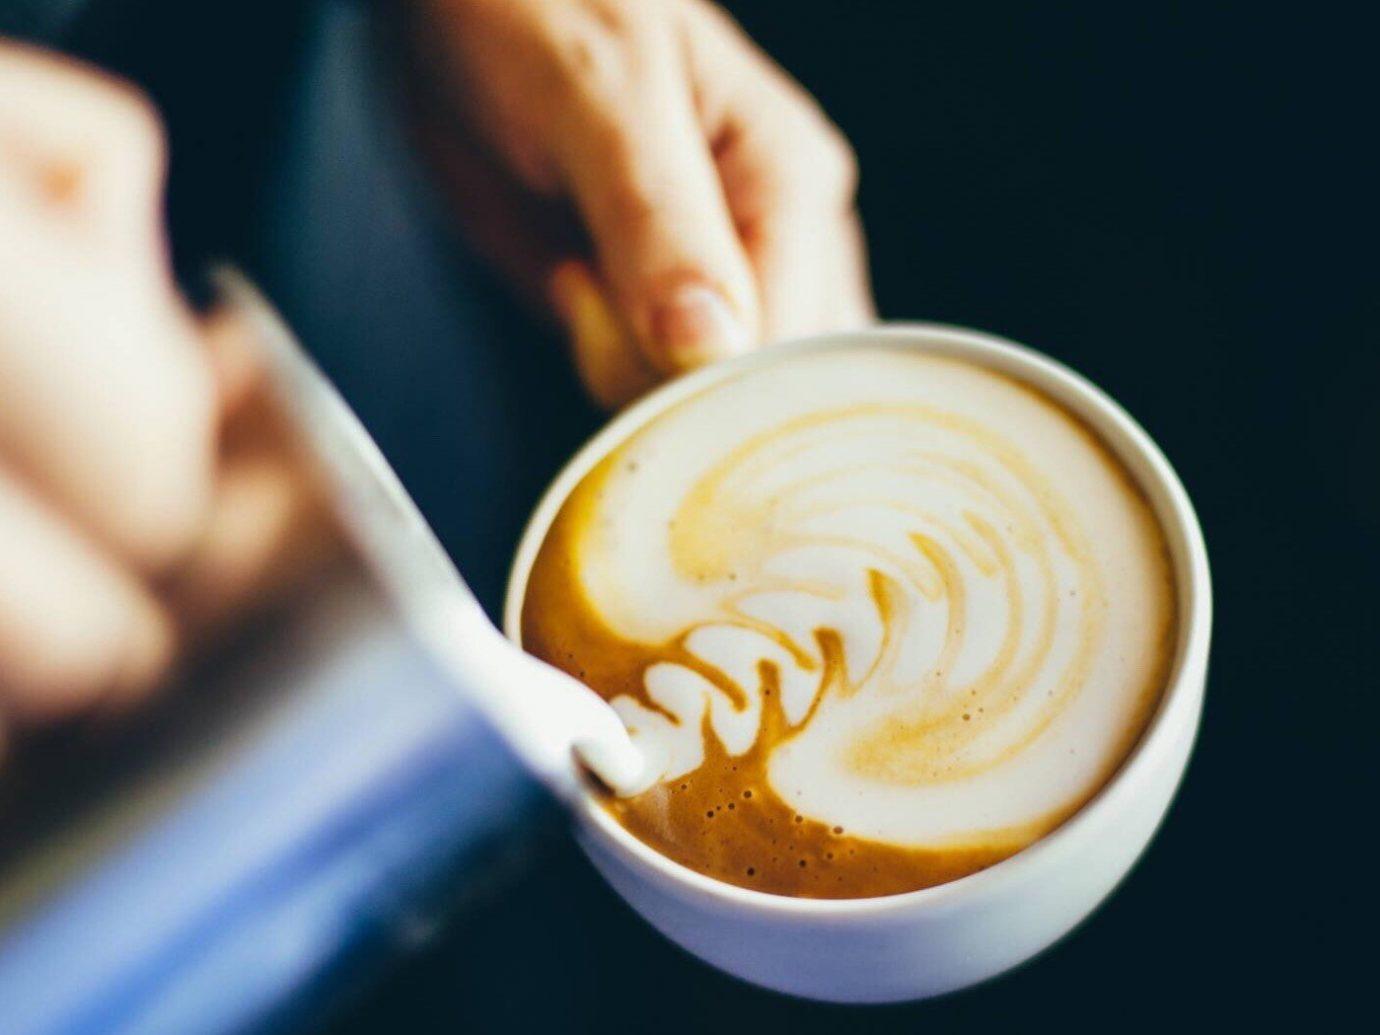 Food + Drink Offbeat Travel Trends cup coffee latte flat white Drink food cappuccino espresso caffè macchiato caffeine coffee cup coffee milk cuban espresso flavor ristretto café au lait mocaccino beverage close